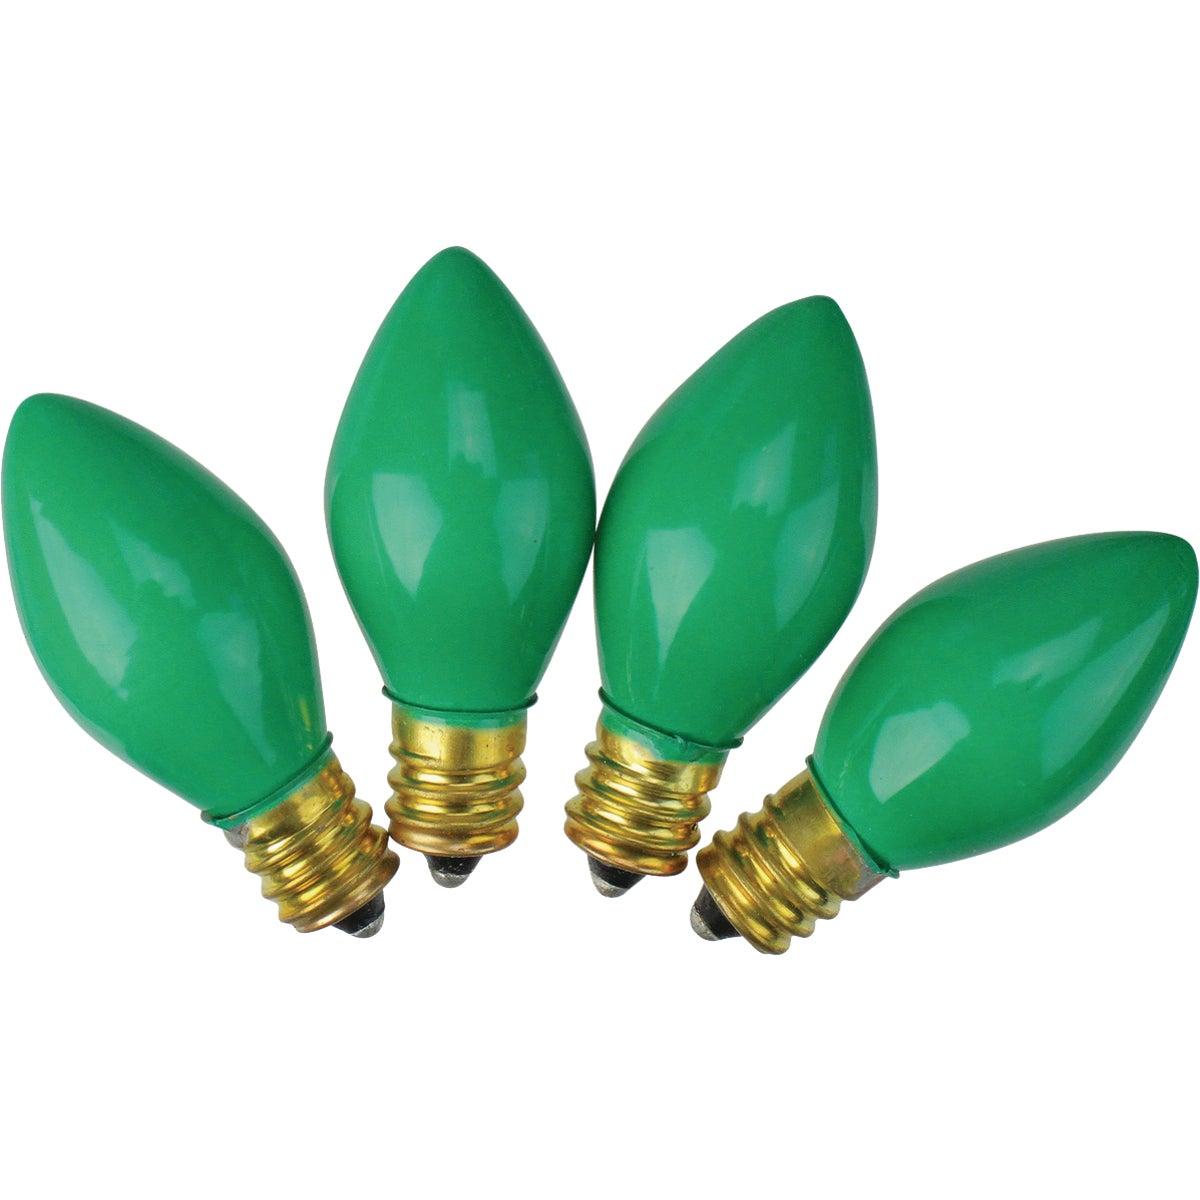 4PK C7 GREEN CERAM BULB